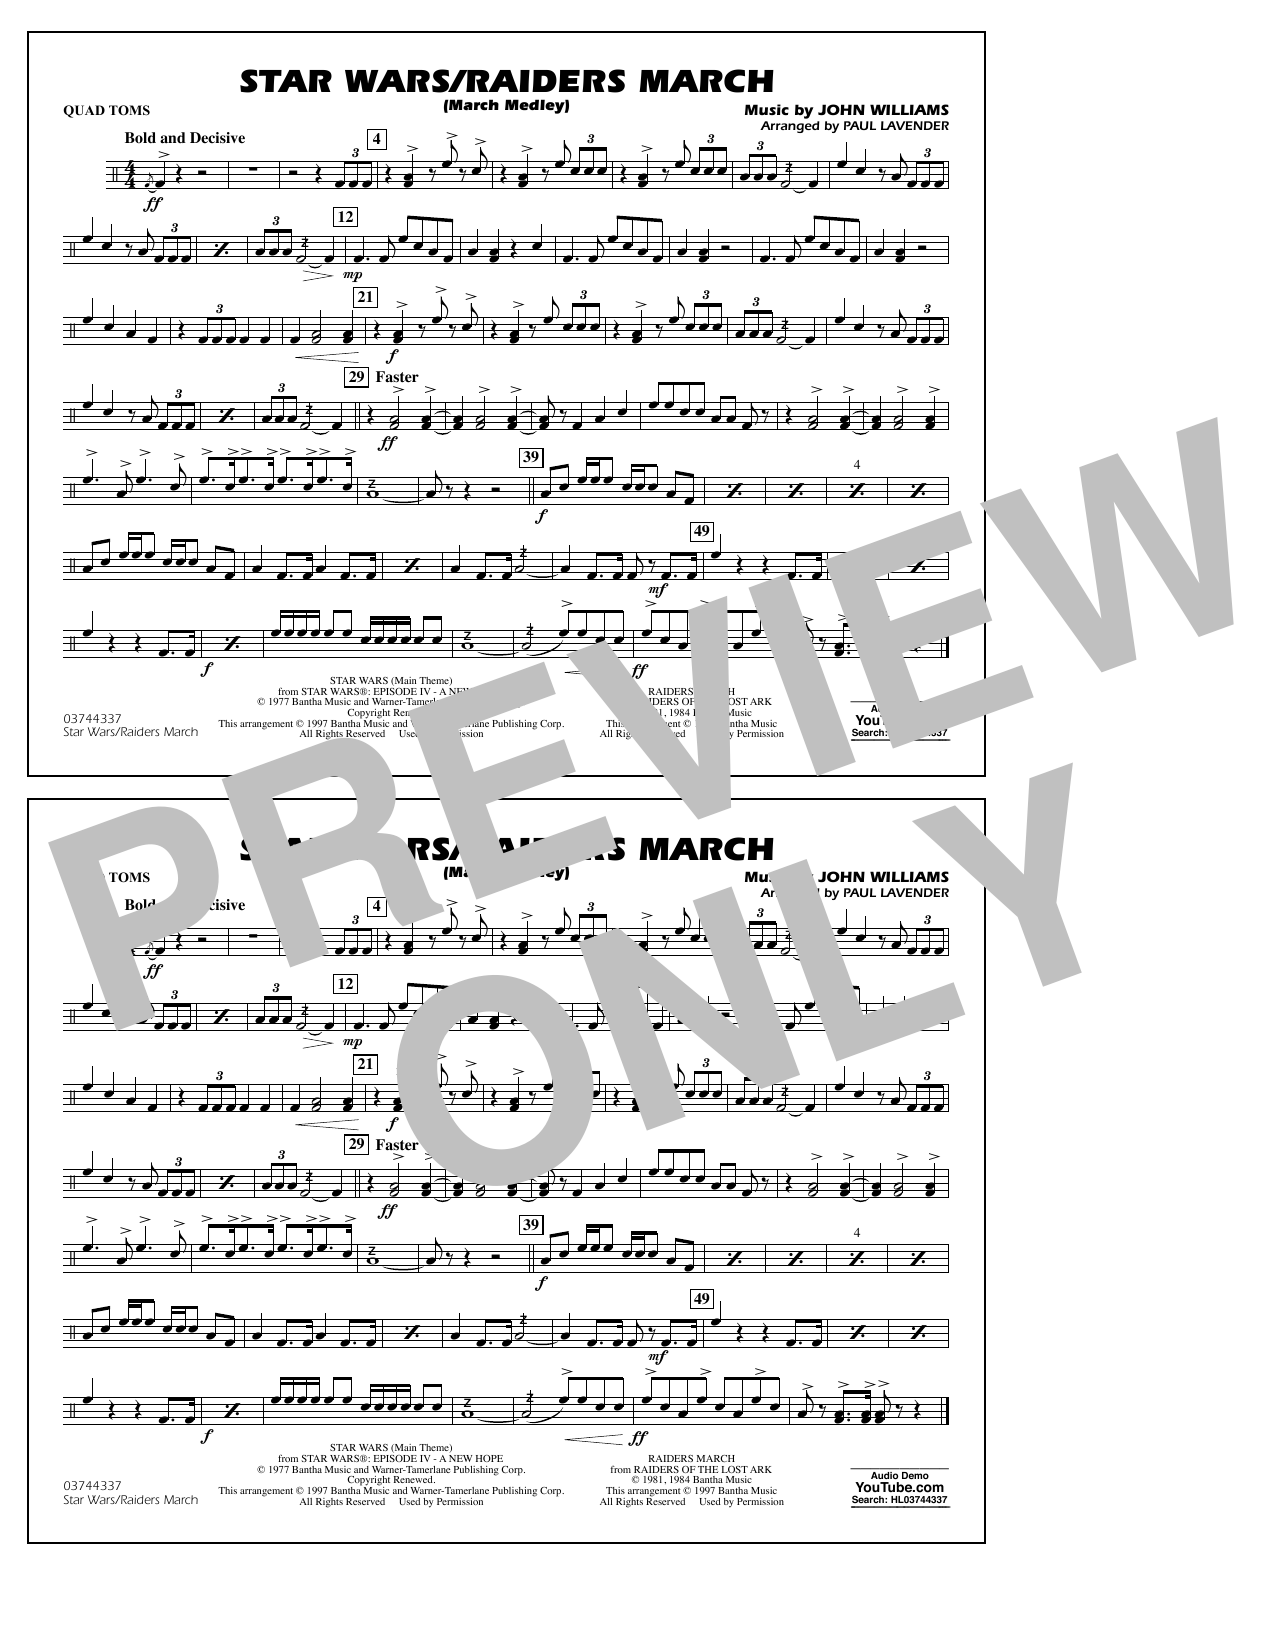 Star Wars/Raiders March - Quad Toms Digitale Noten